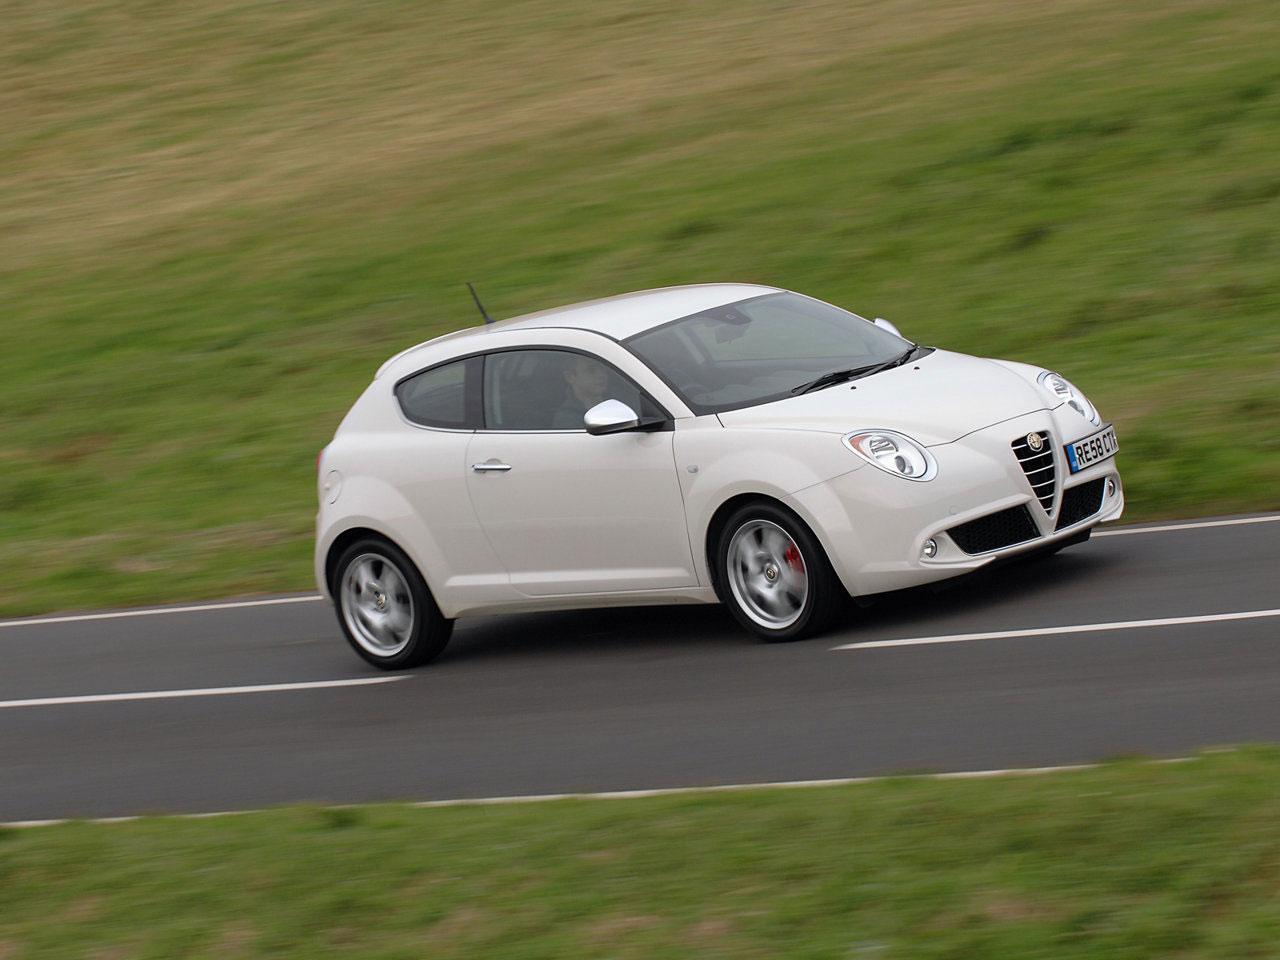 Alfa Romeo Mito 23 Widescreen Car Wallpaper